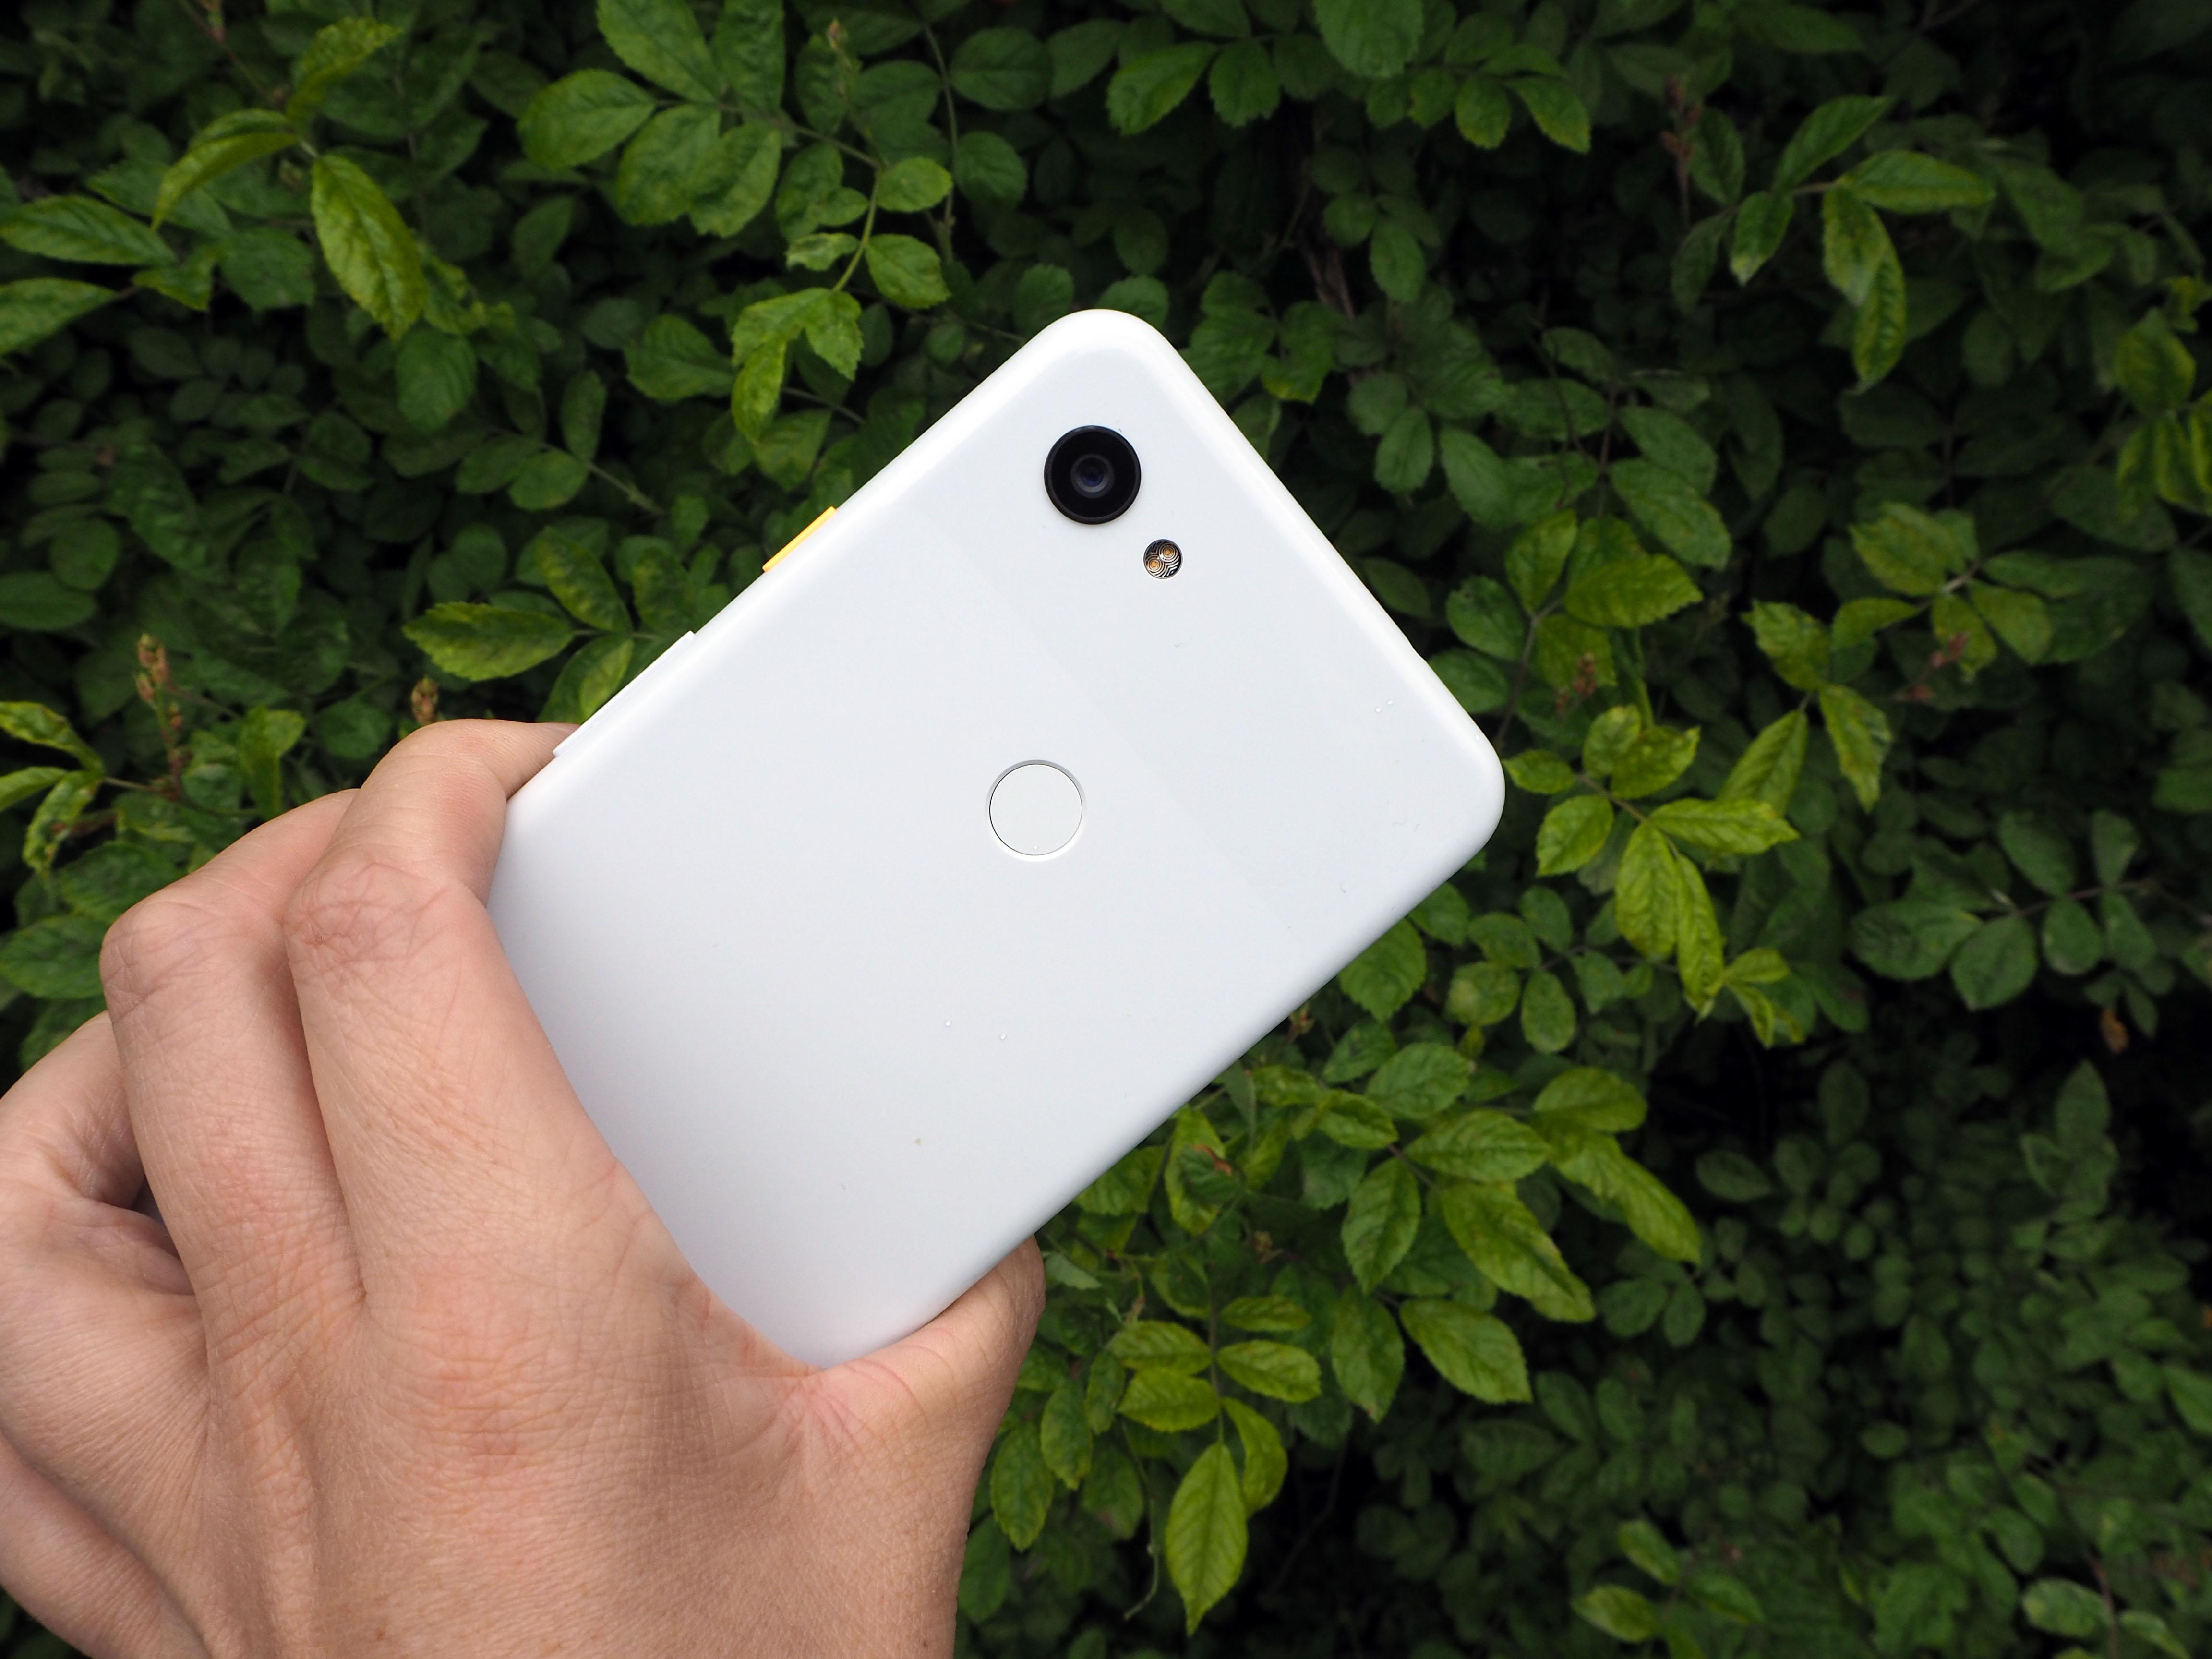 Google Pixel 3a XL Review: Sample Photos, Video & Specs